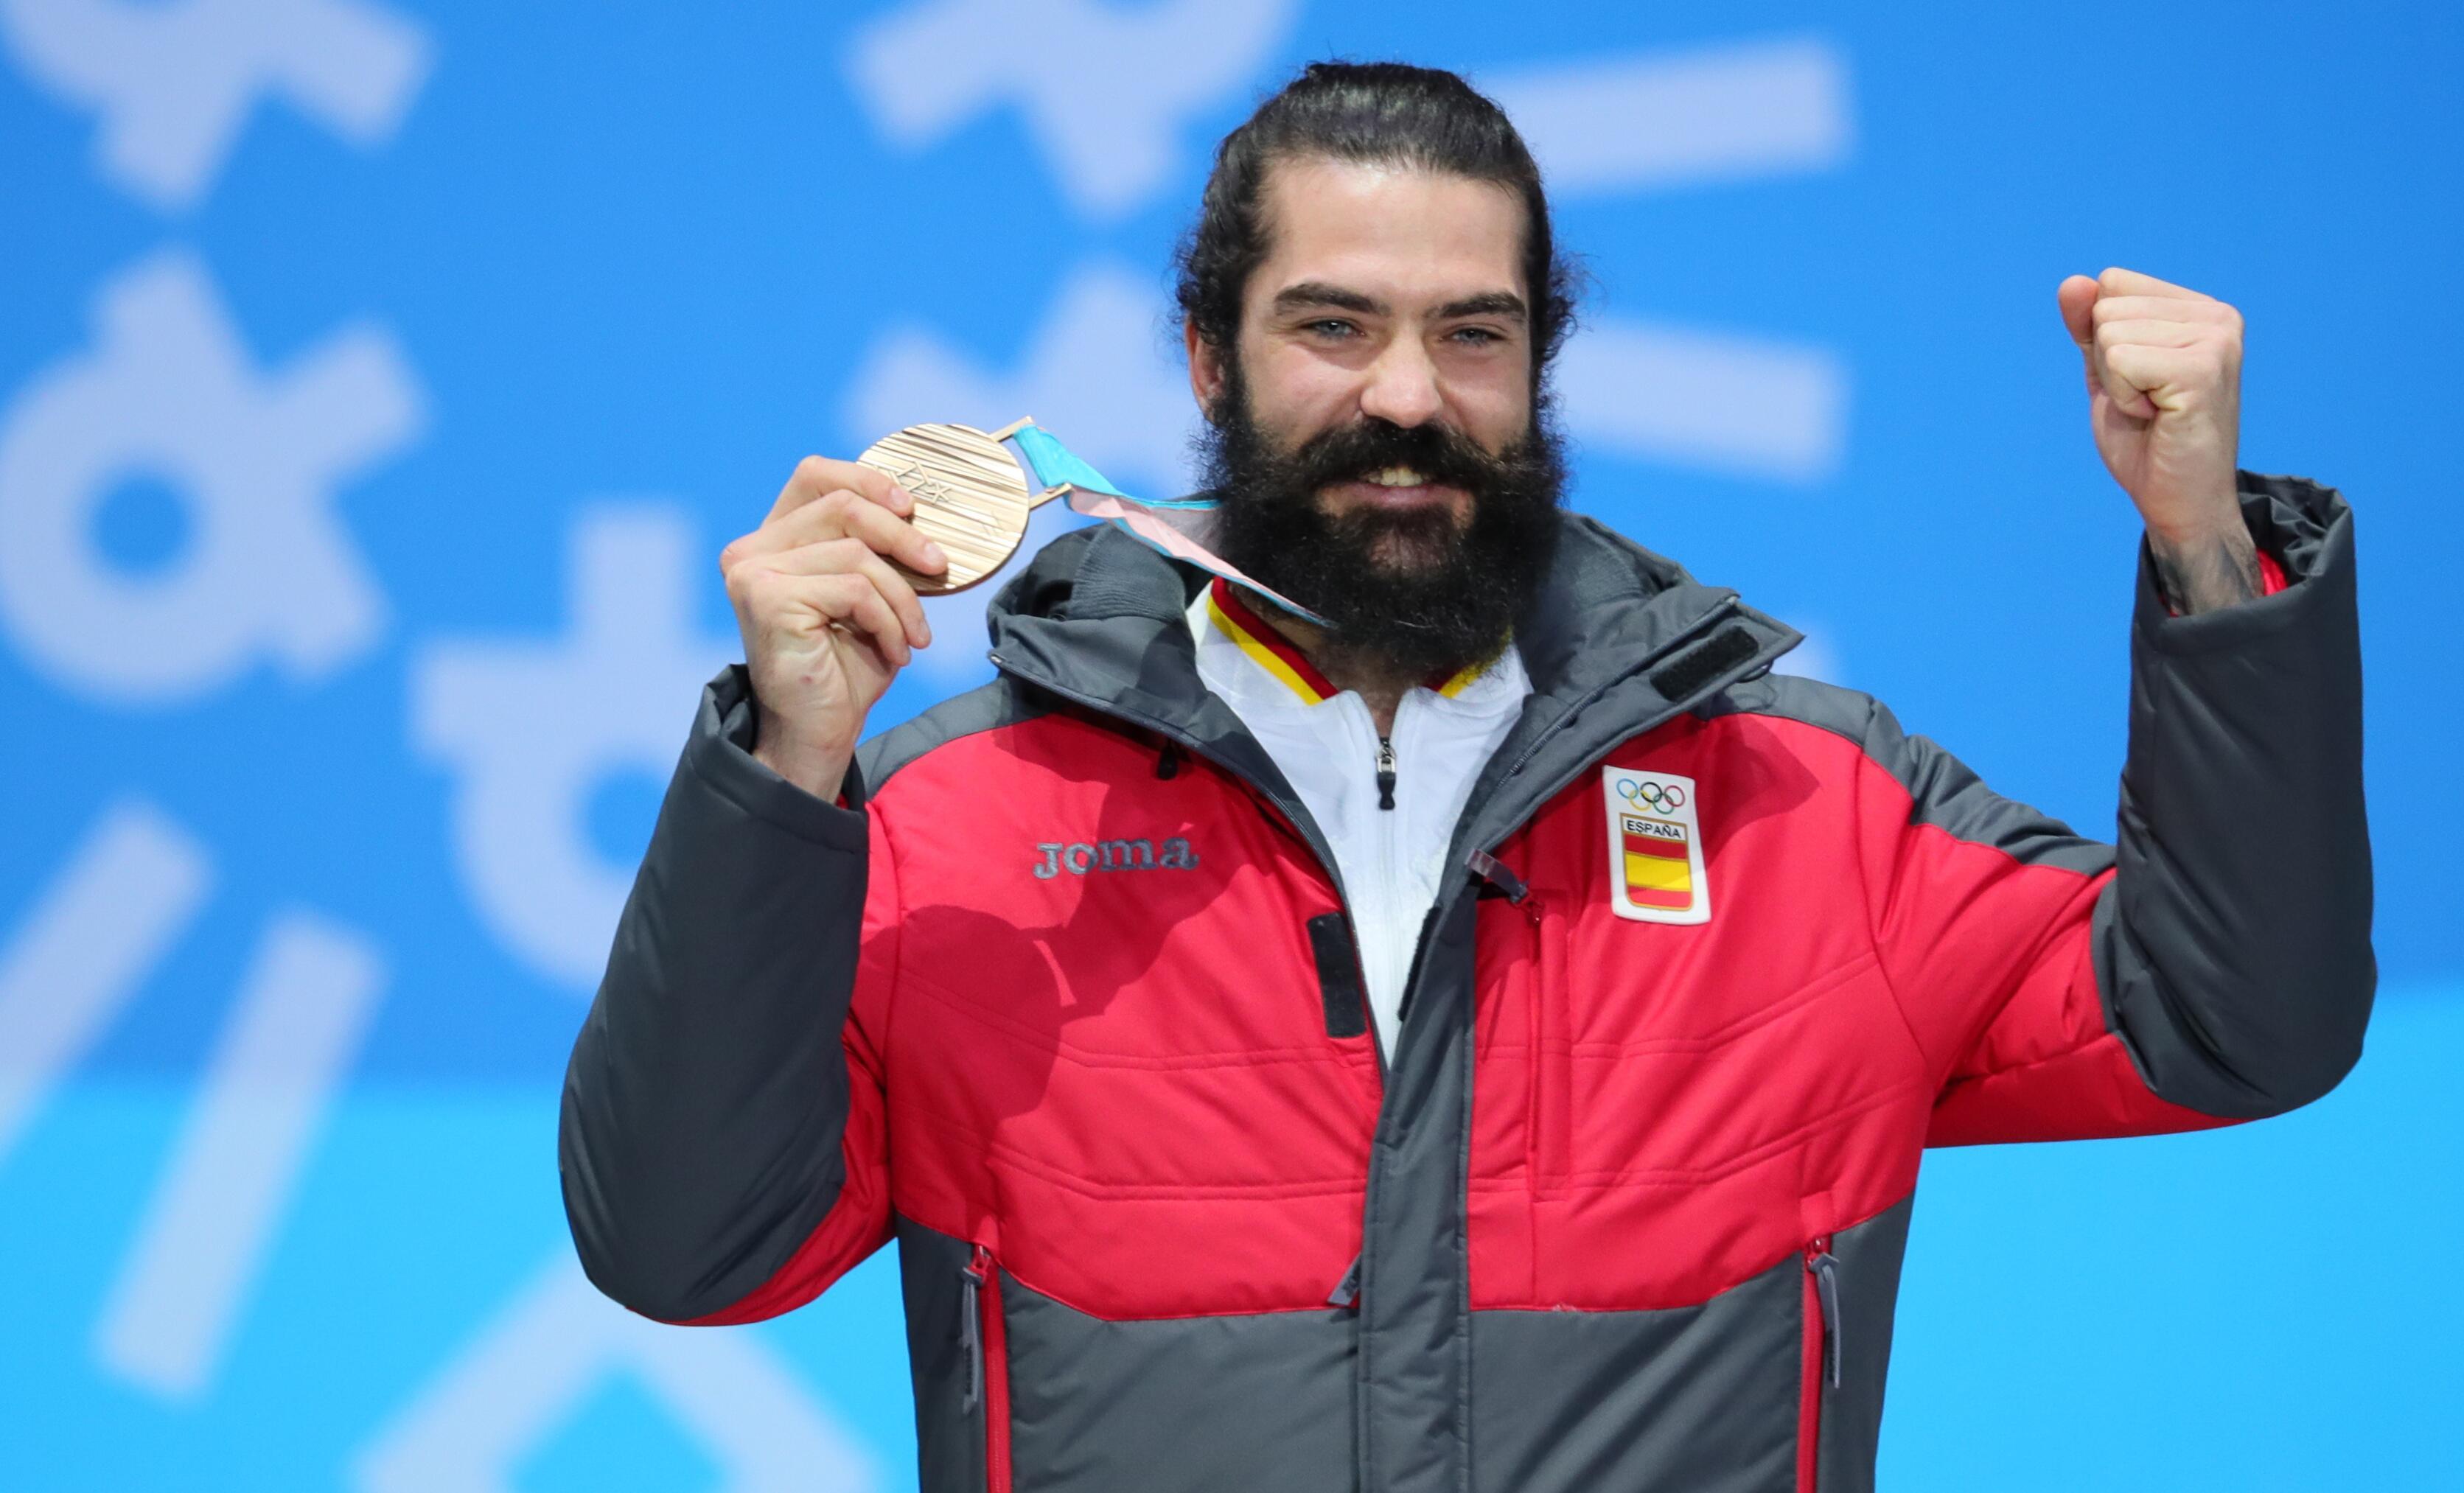 Bild zu Regino Hernandez, Olympia, Olympische Winterspiele, Pyeongchang